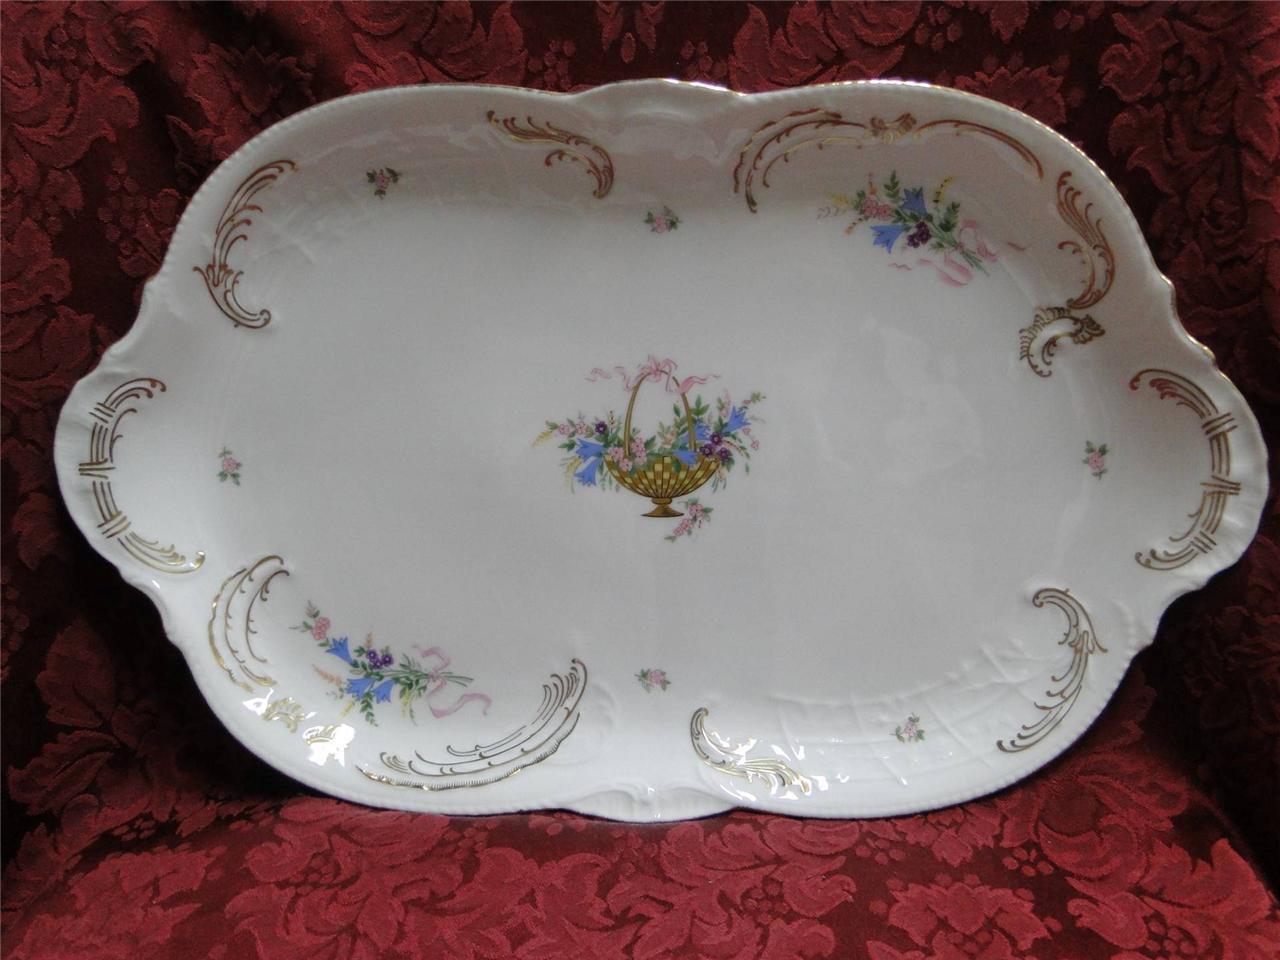 pinknthal Rokoko, Flower Basket, Ribbons  Platter, 15.5